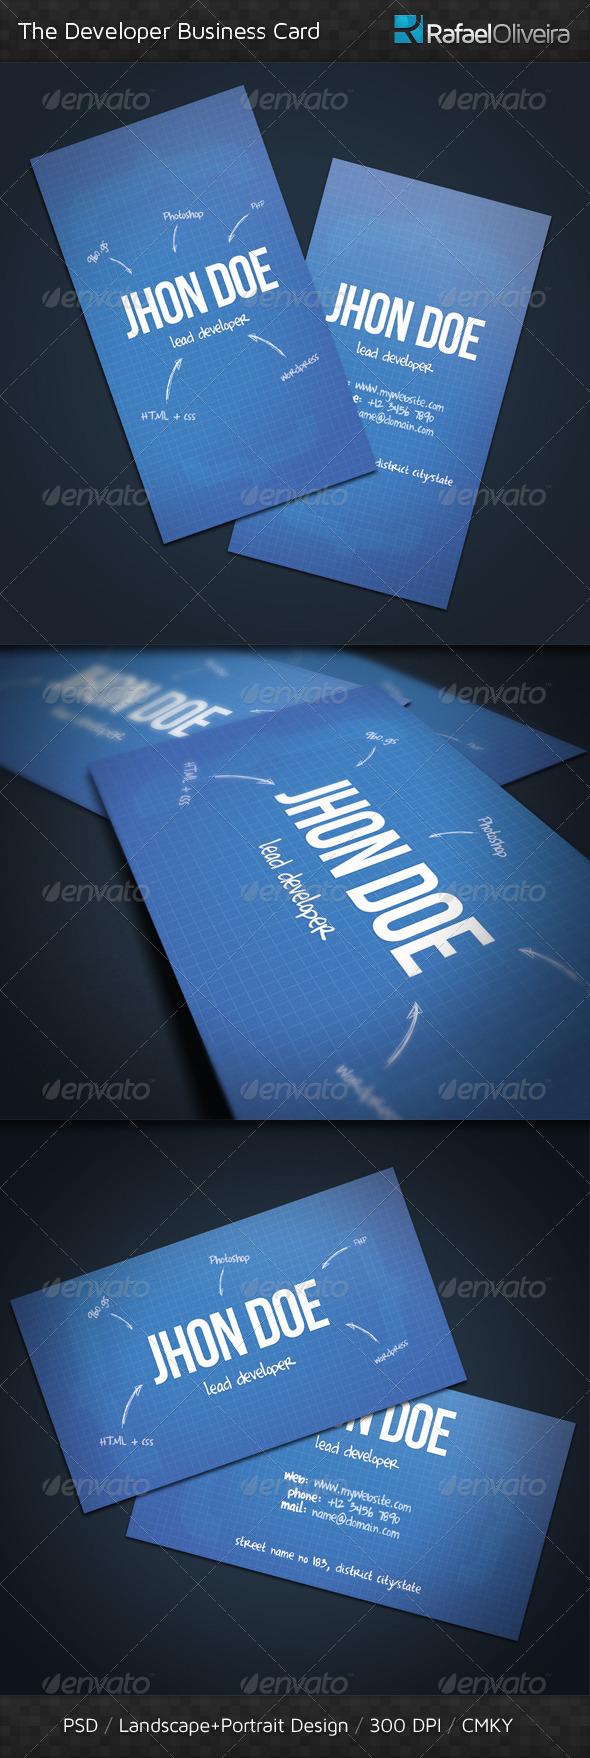 GraphicRiver The Developer Business Card 400290